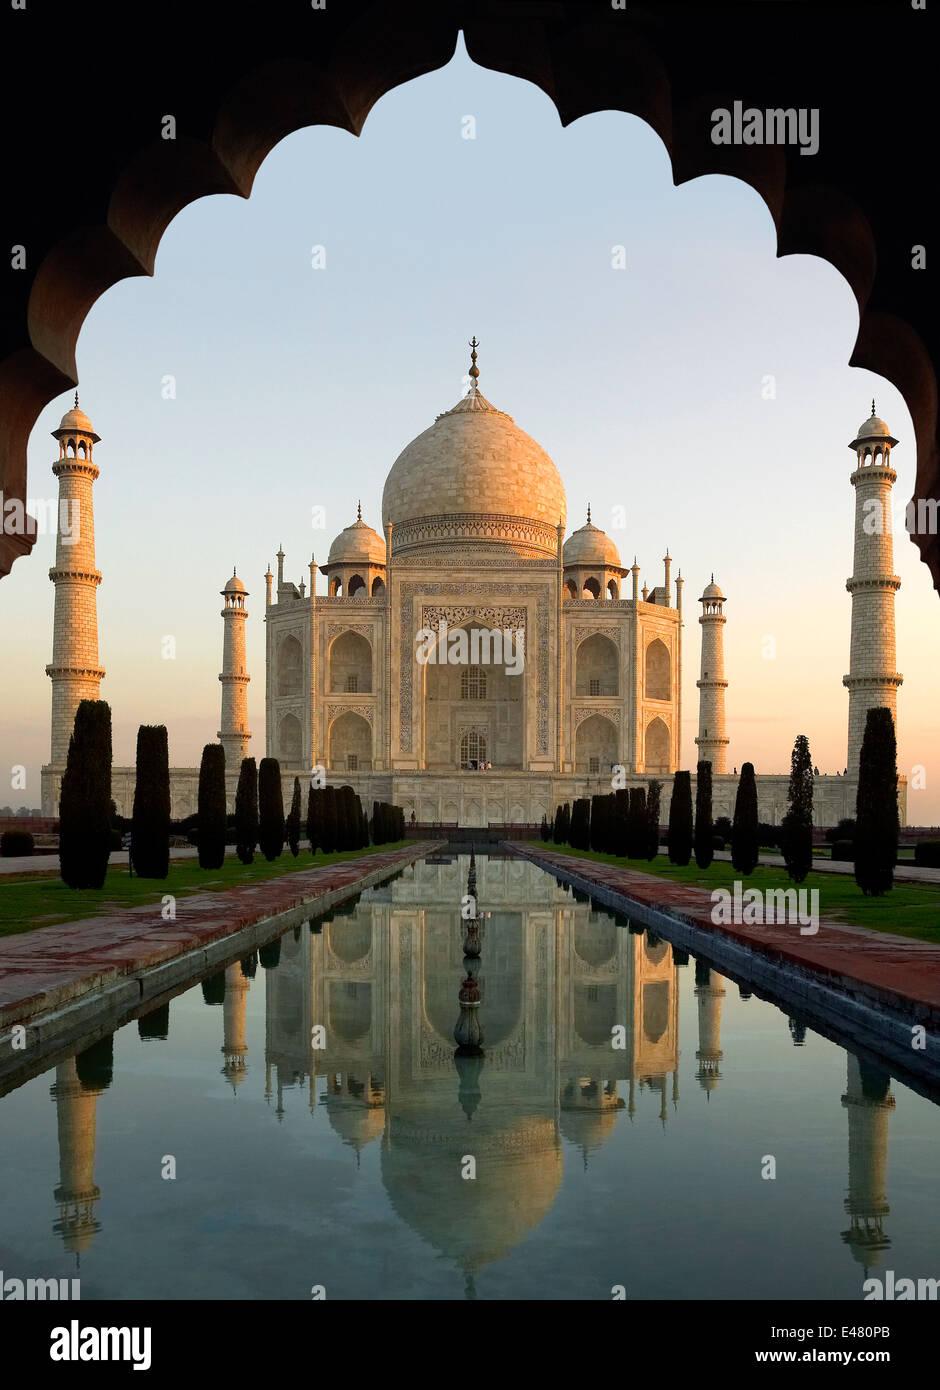 Taj Mahal at Dawn - Agra - India - Stock Image